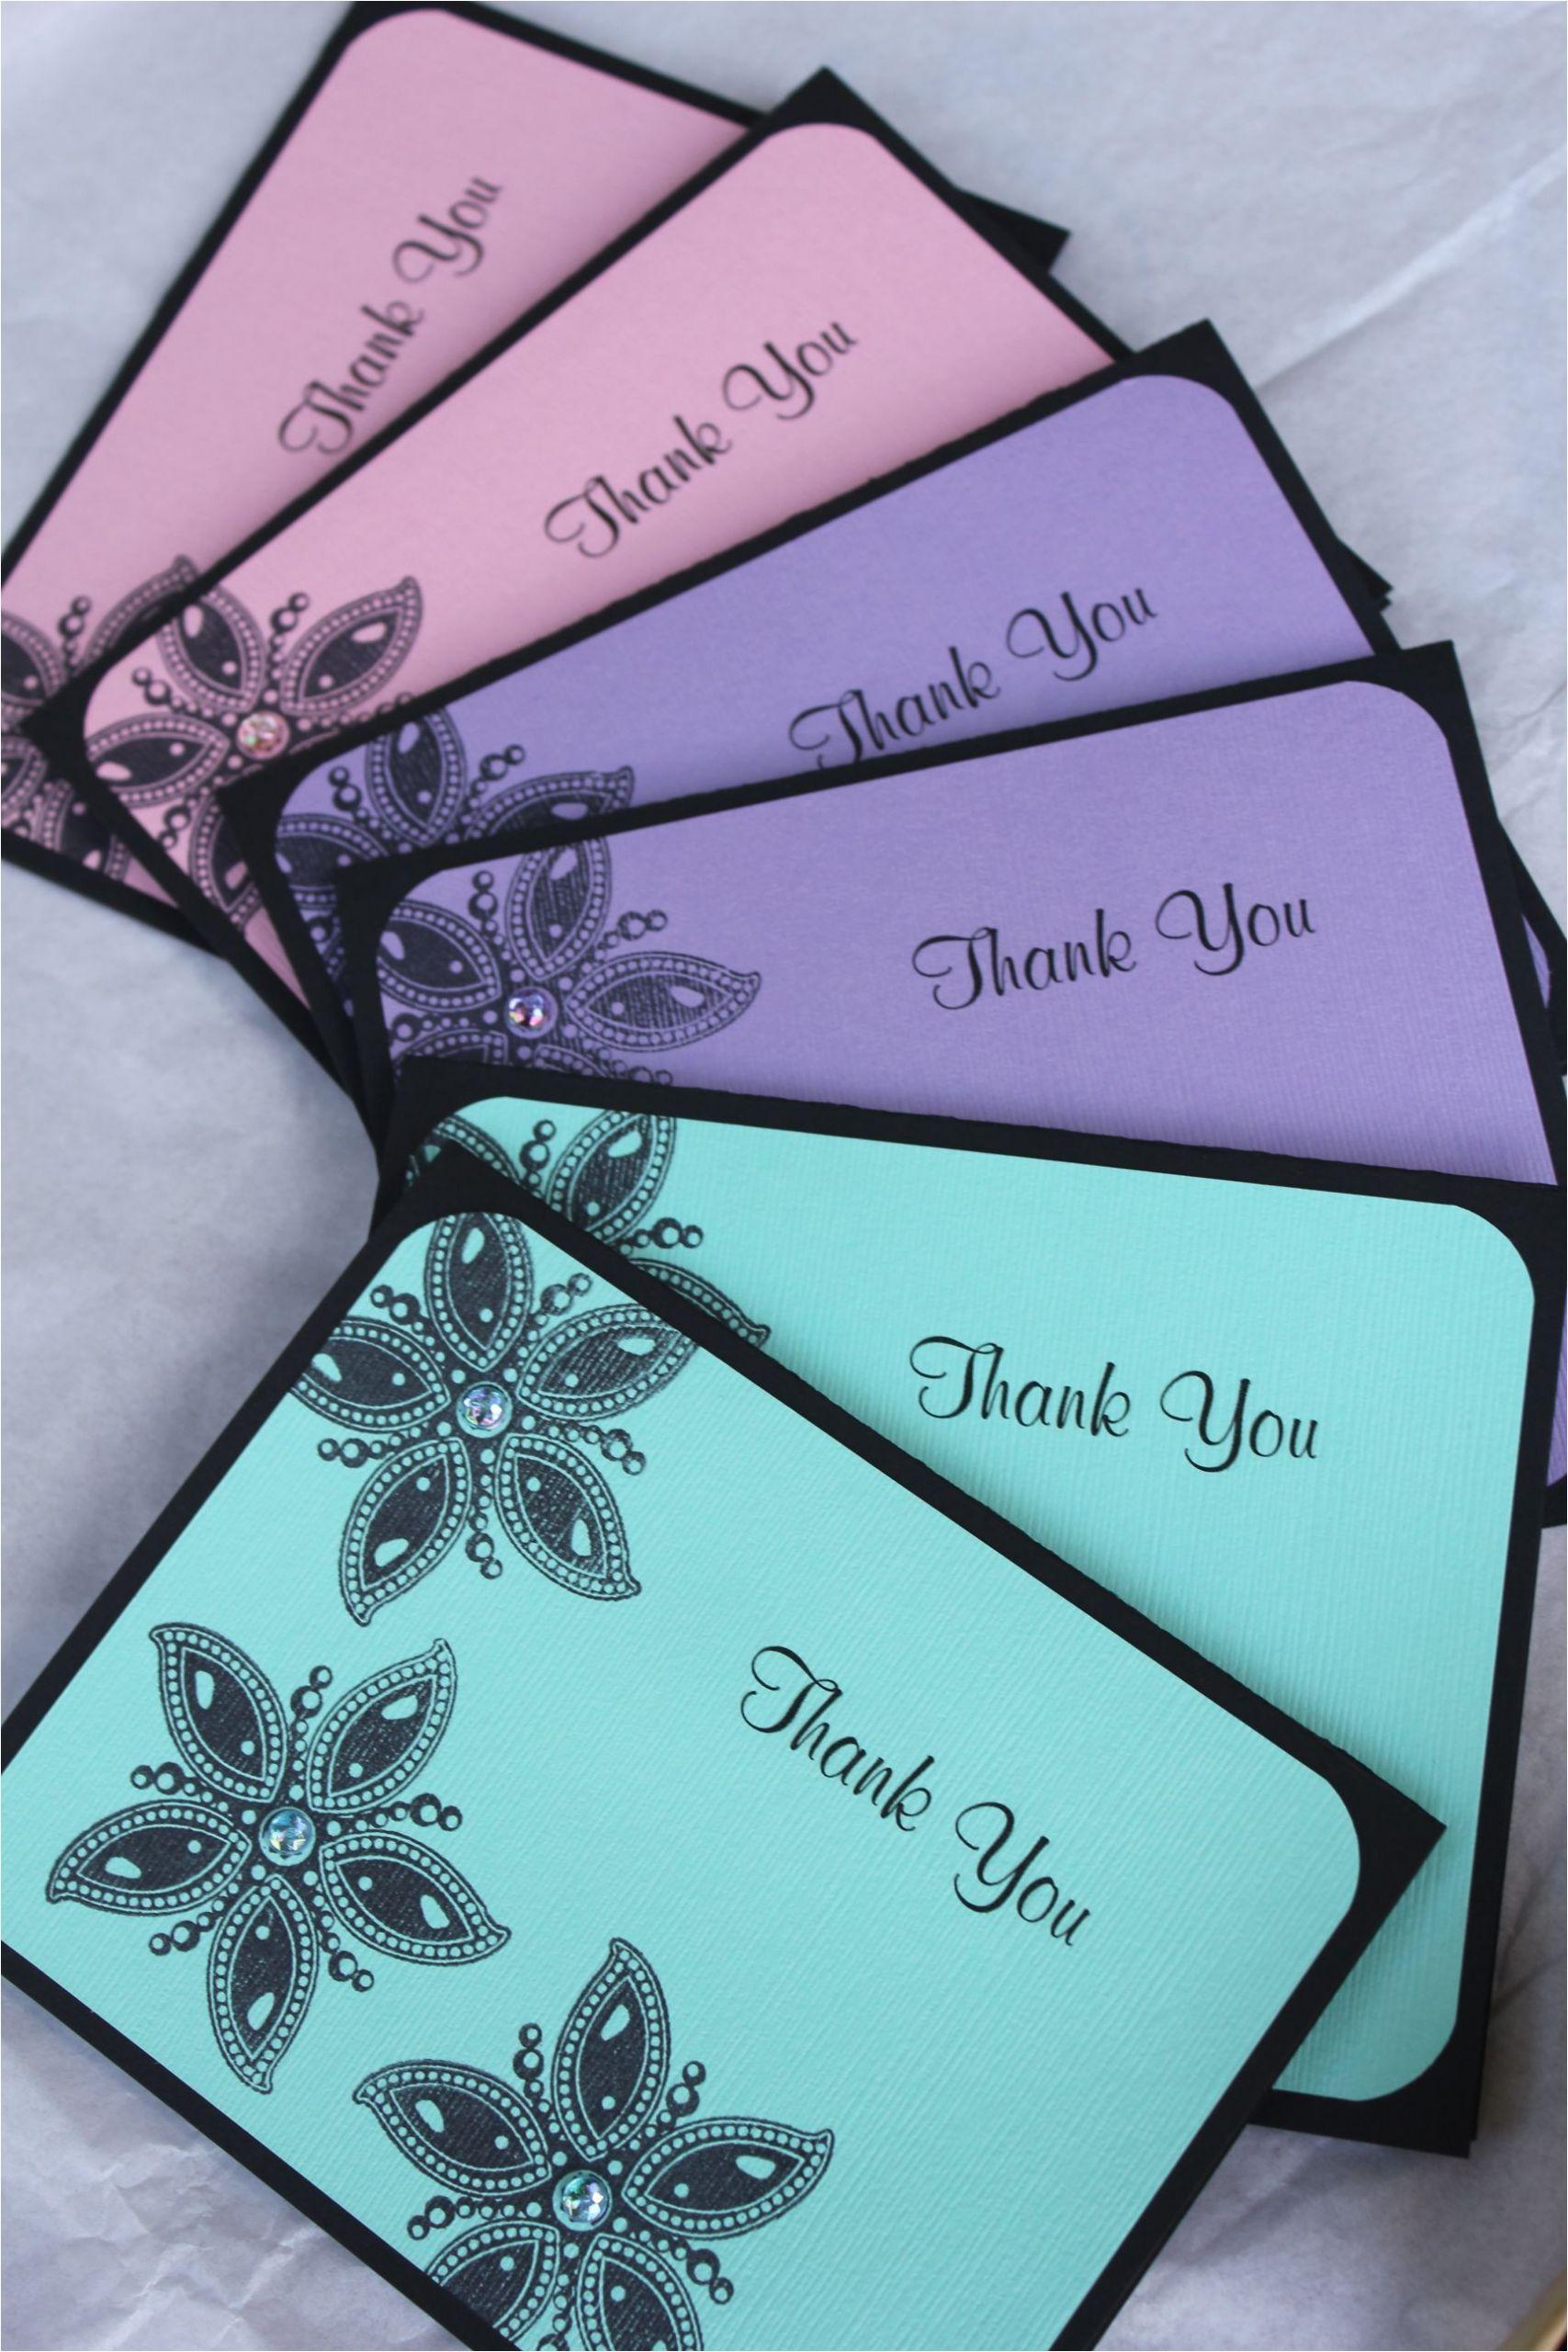 Card Design Handmade Thank You Handmade Thank You Cards by Craftedbylizc Handmade Thank